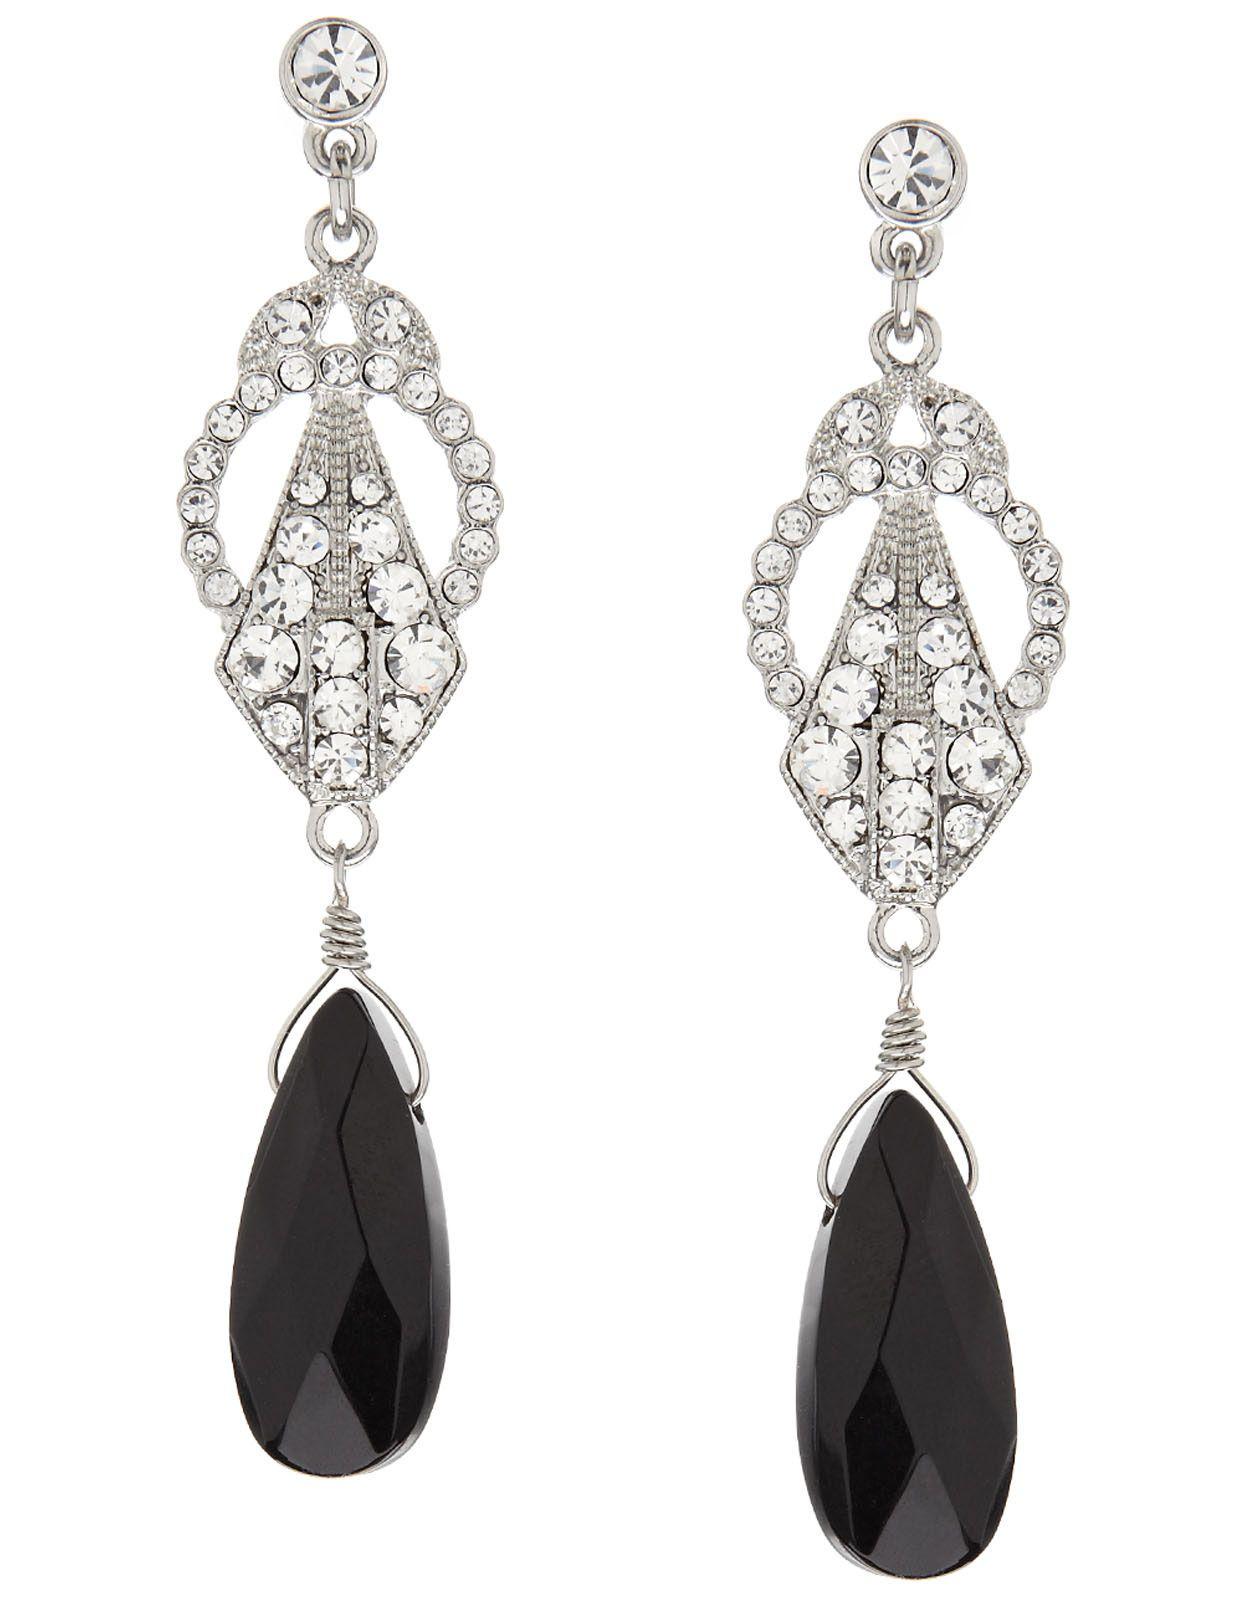 Baroque Stone Short Drop Earrings Adornments Pinterest